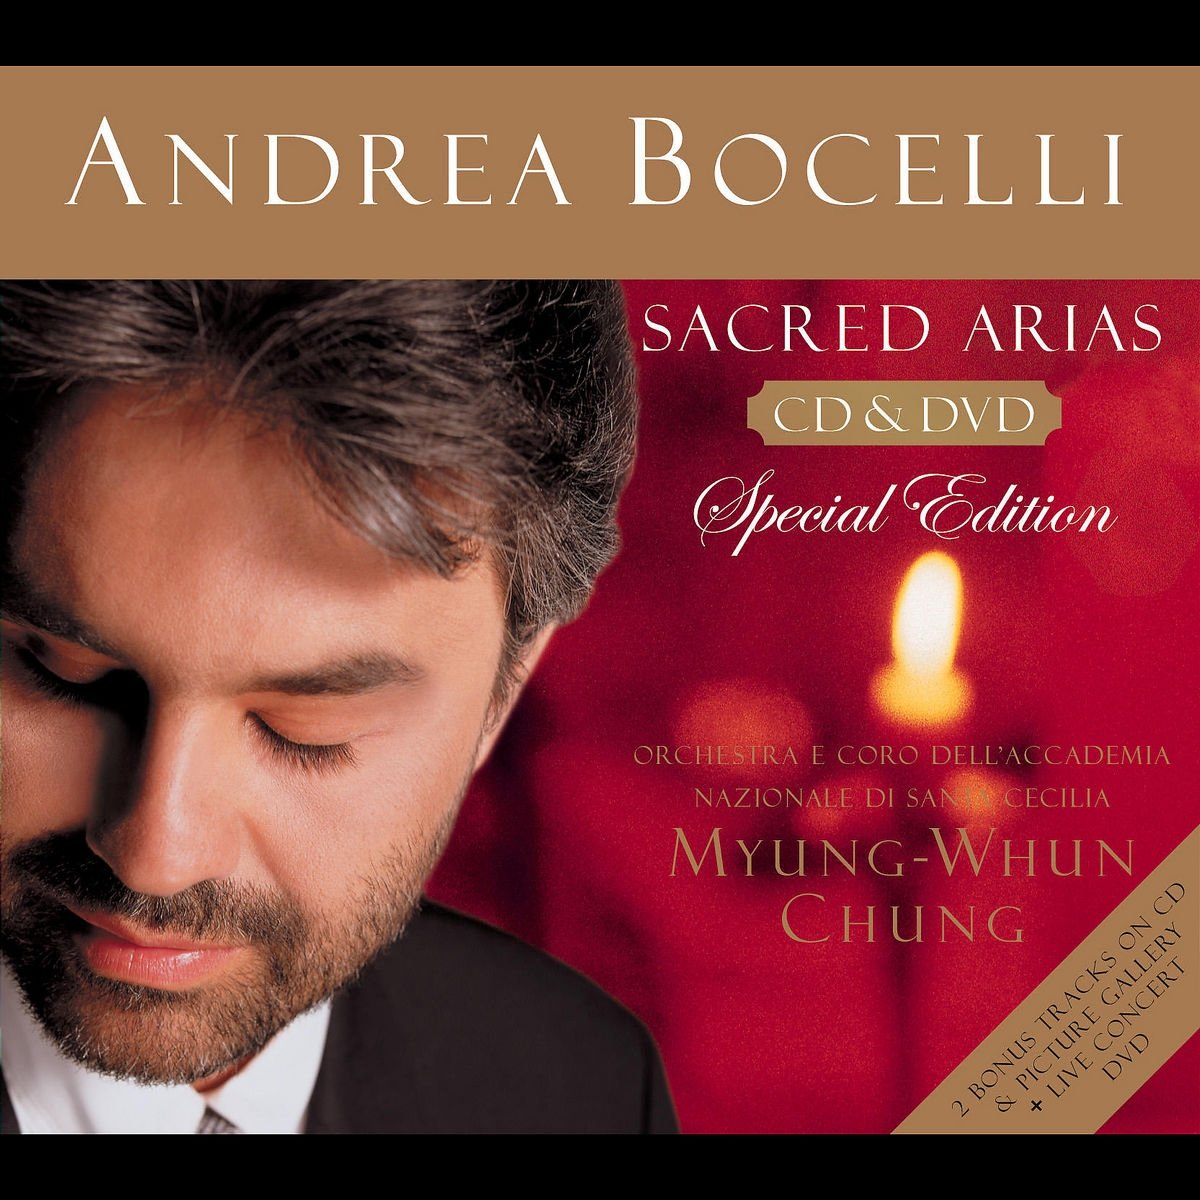 Sacred Arias Cd + dvd kopen